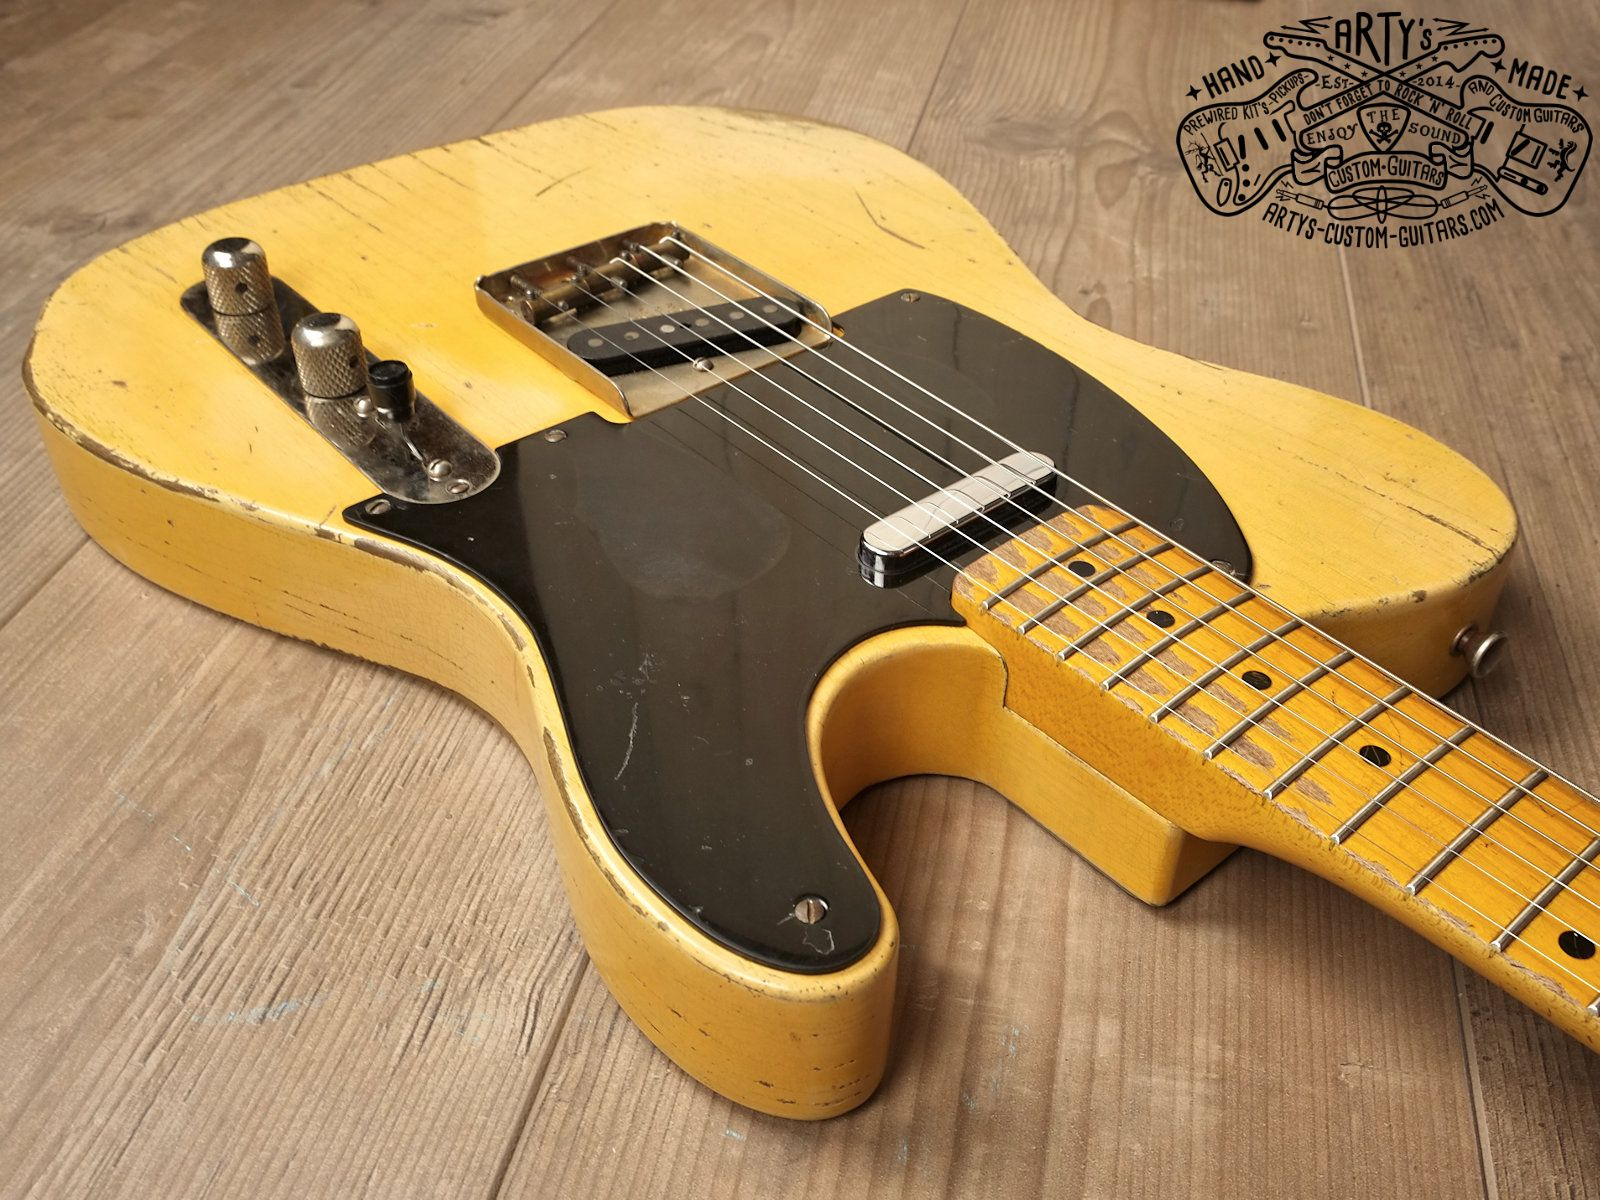 broadcaster butterscotch blonde telecaster heavy relic tele maple neck swamp ash body bakelite pickguard aged nitro finish arty s custom guitars [ 1600 x 1200 Pixel ]